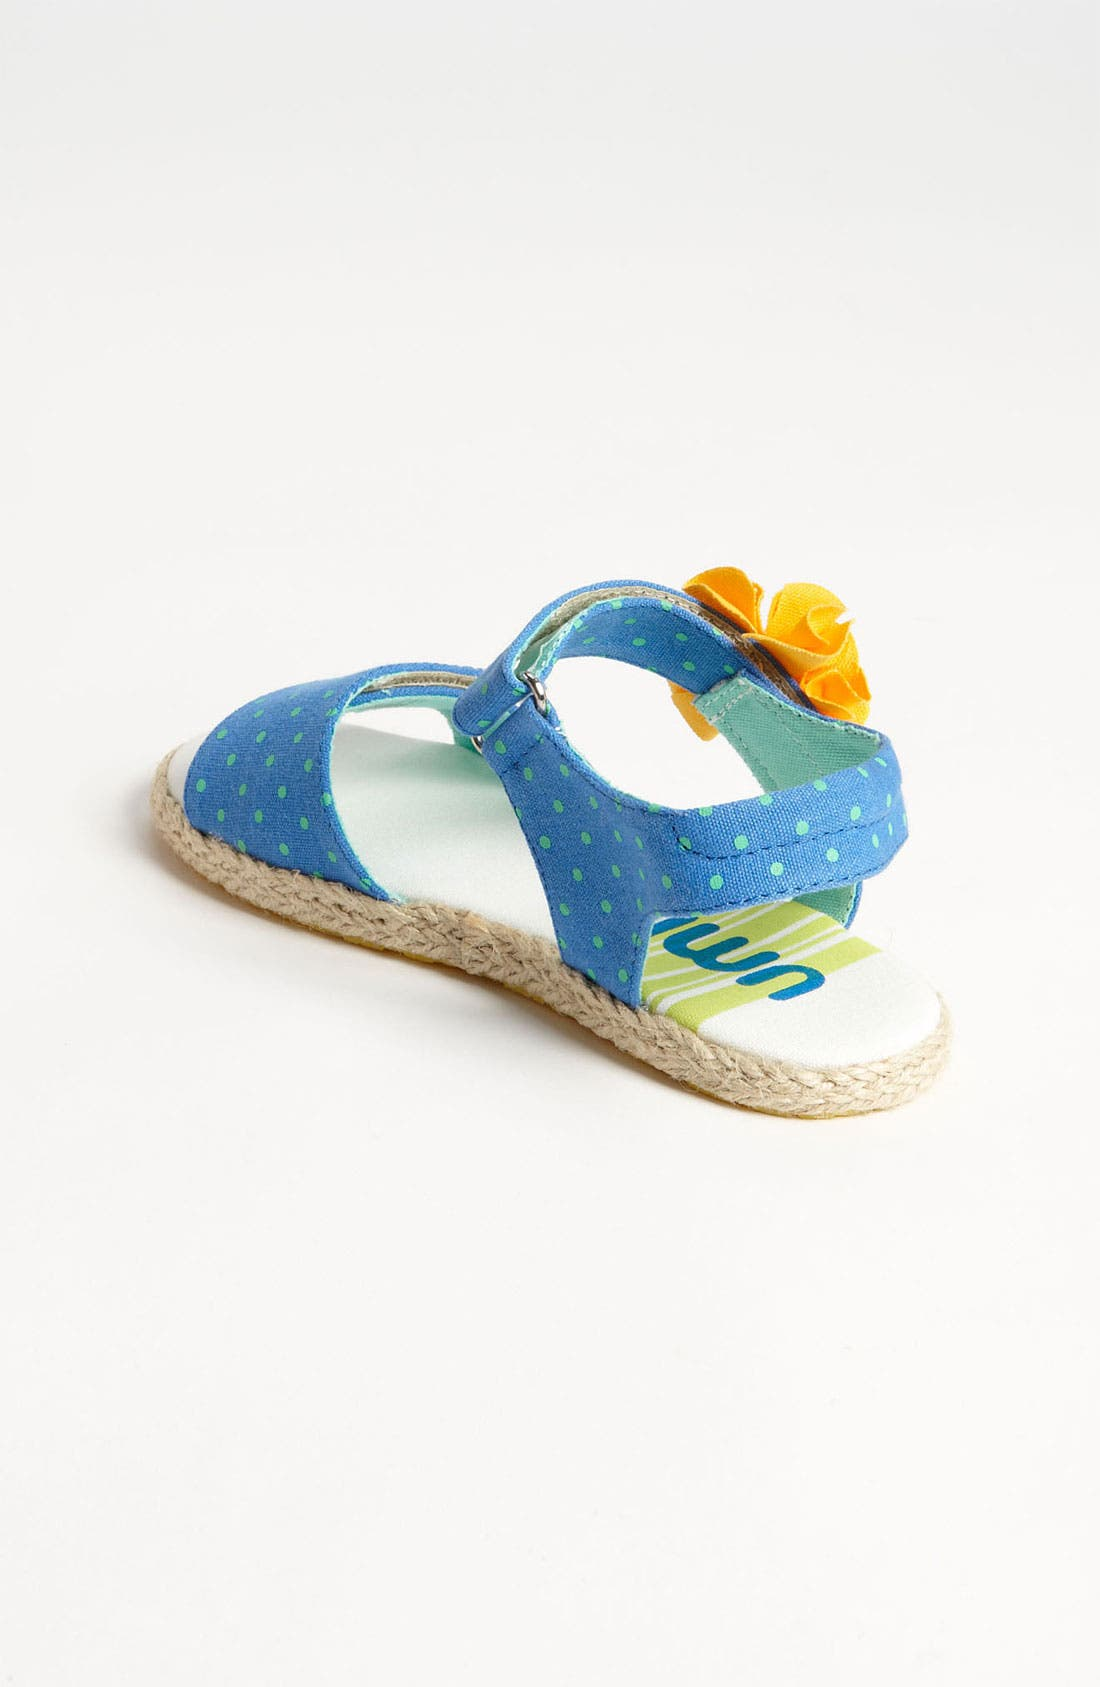 Alternate Image 2  - Umi 'Giselle' Sandal (Toddler, Little Kid & Big Kid)